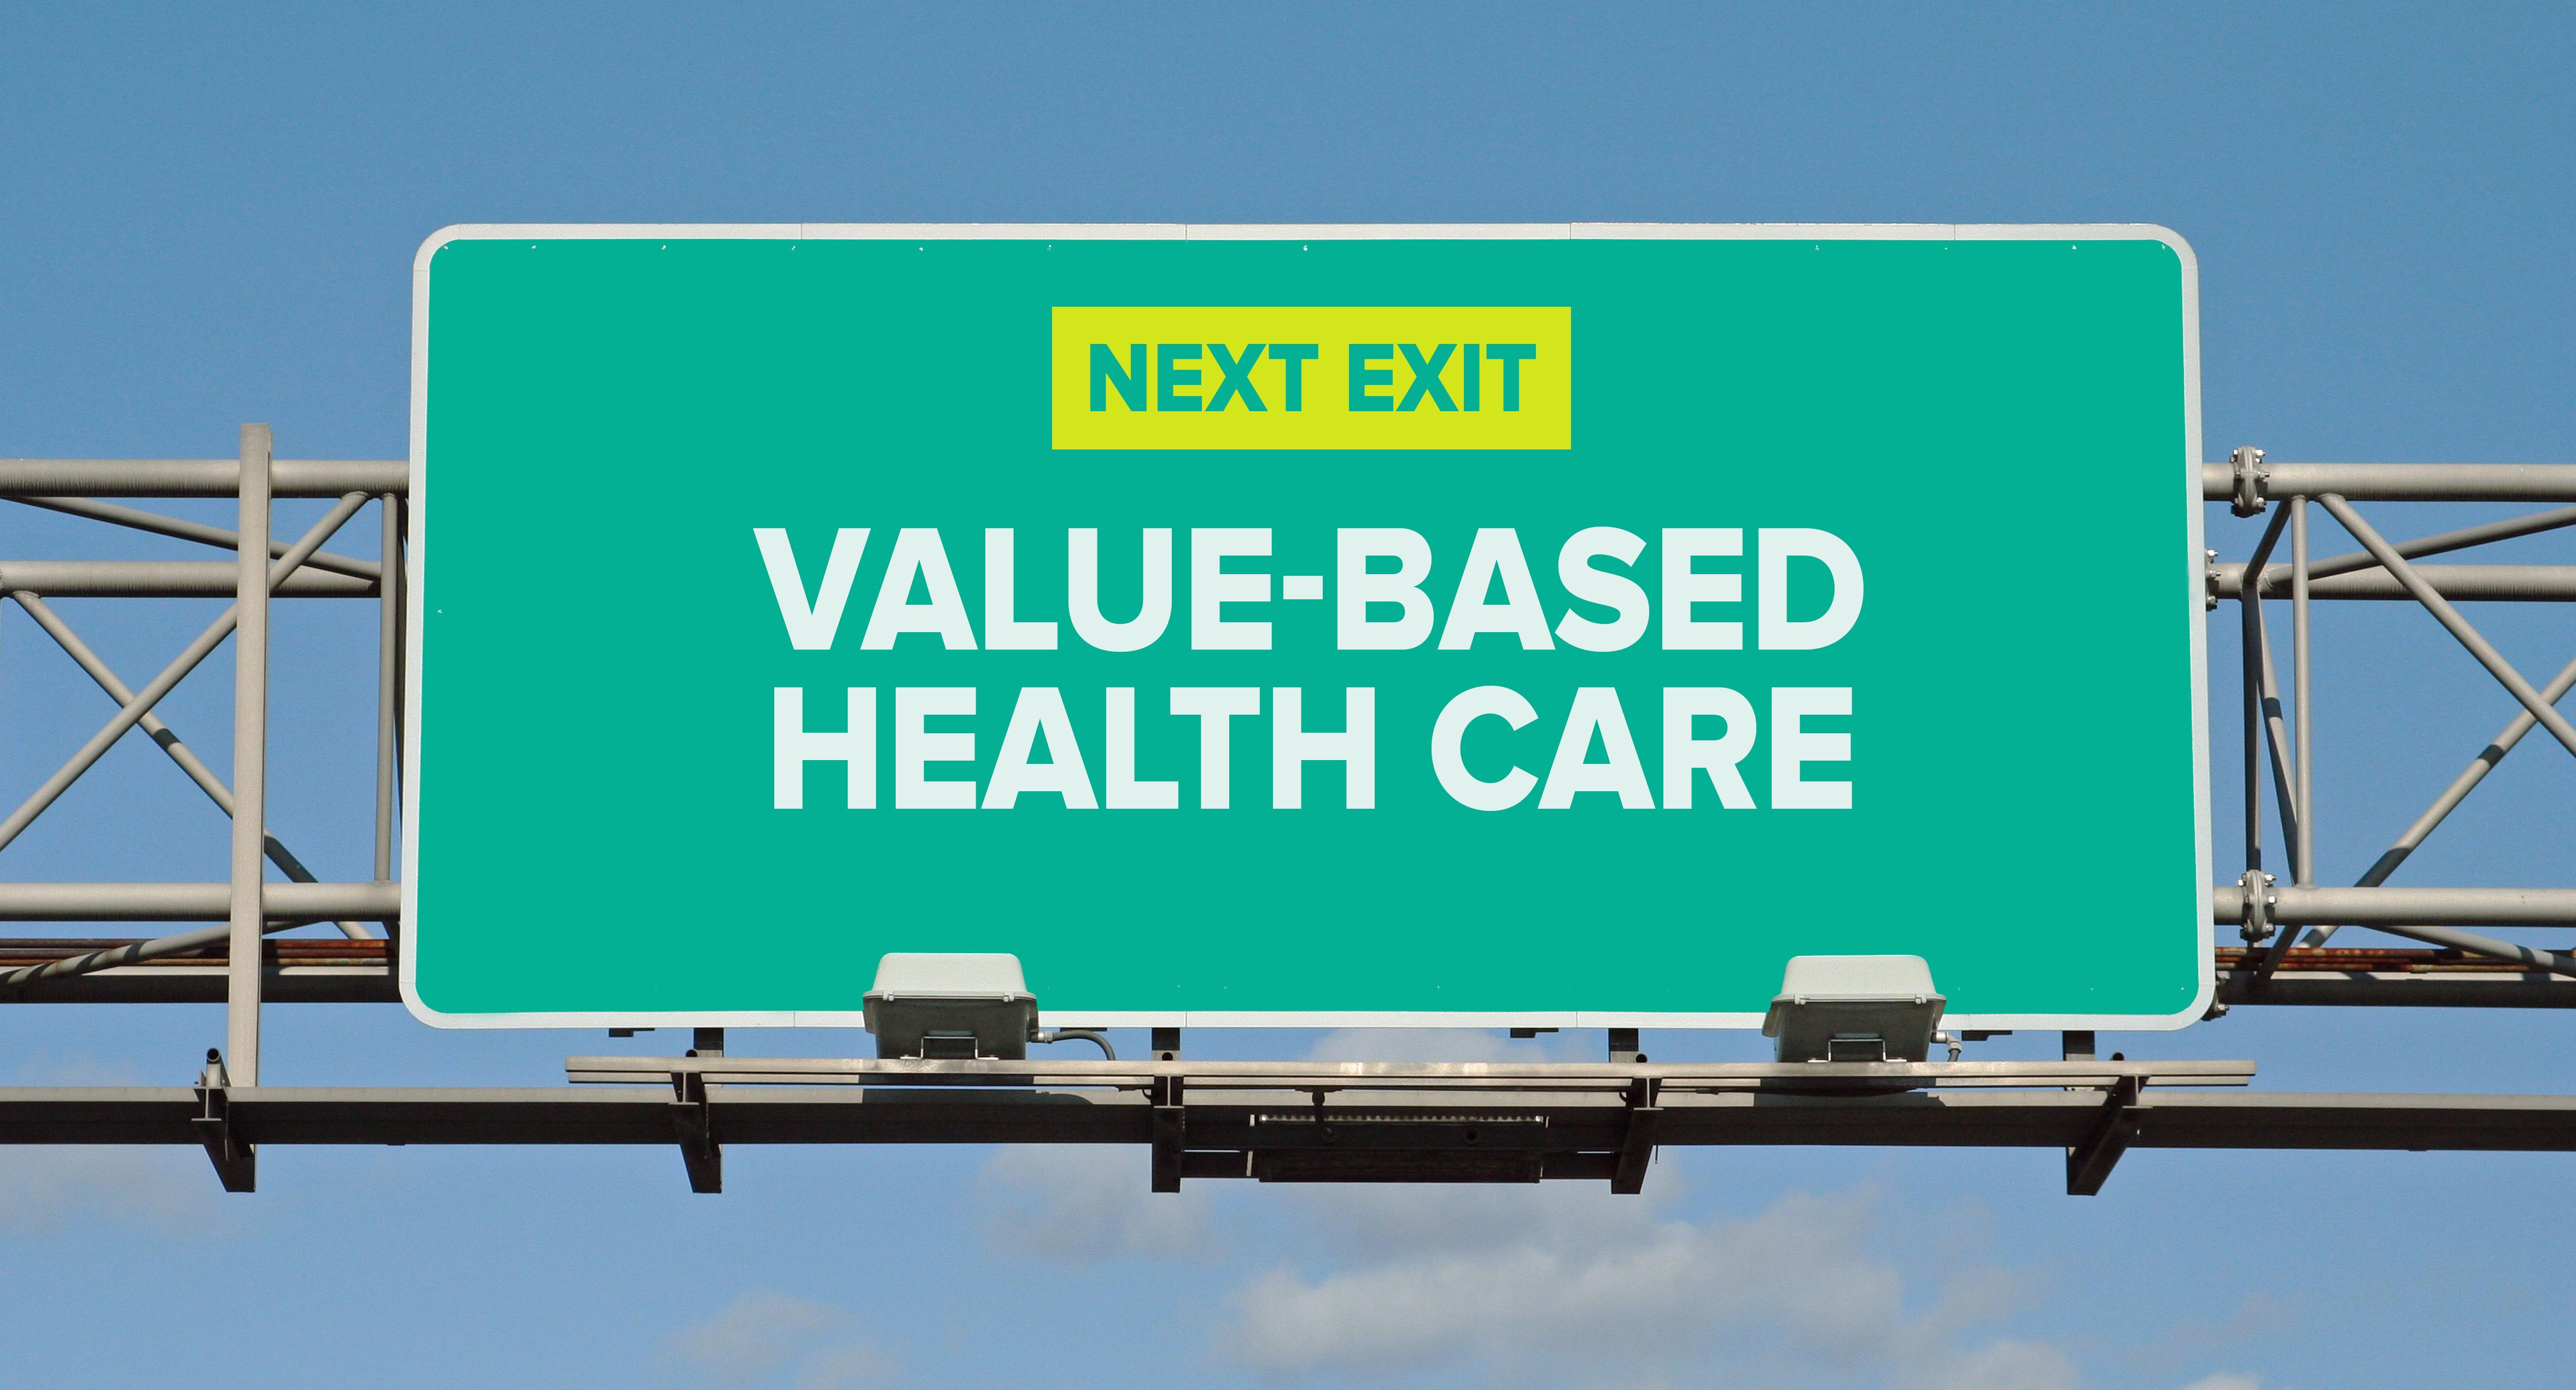 Value-Based_Health_Care_Roadsign.png